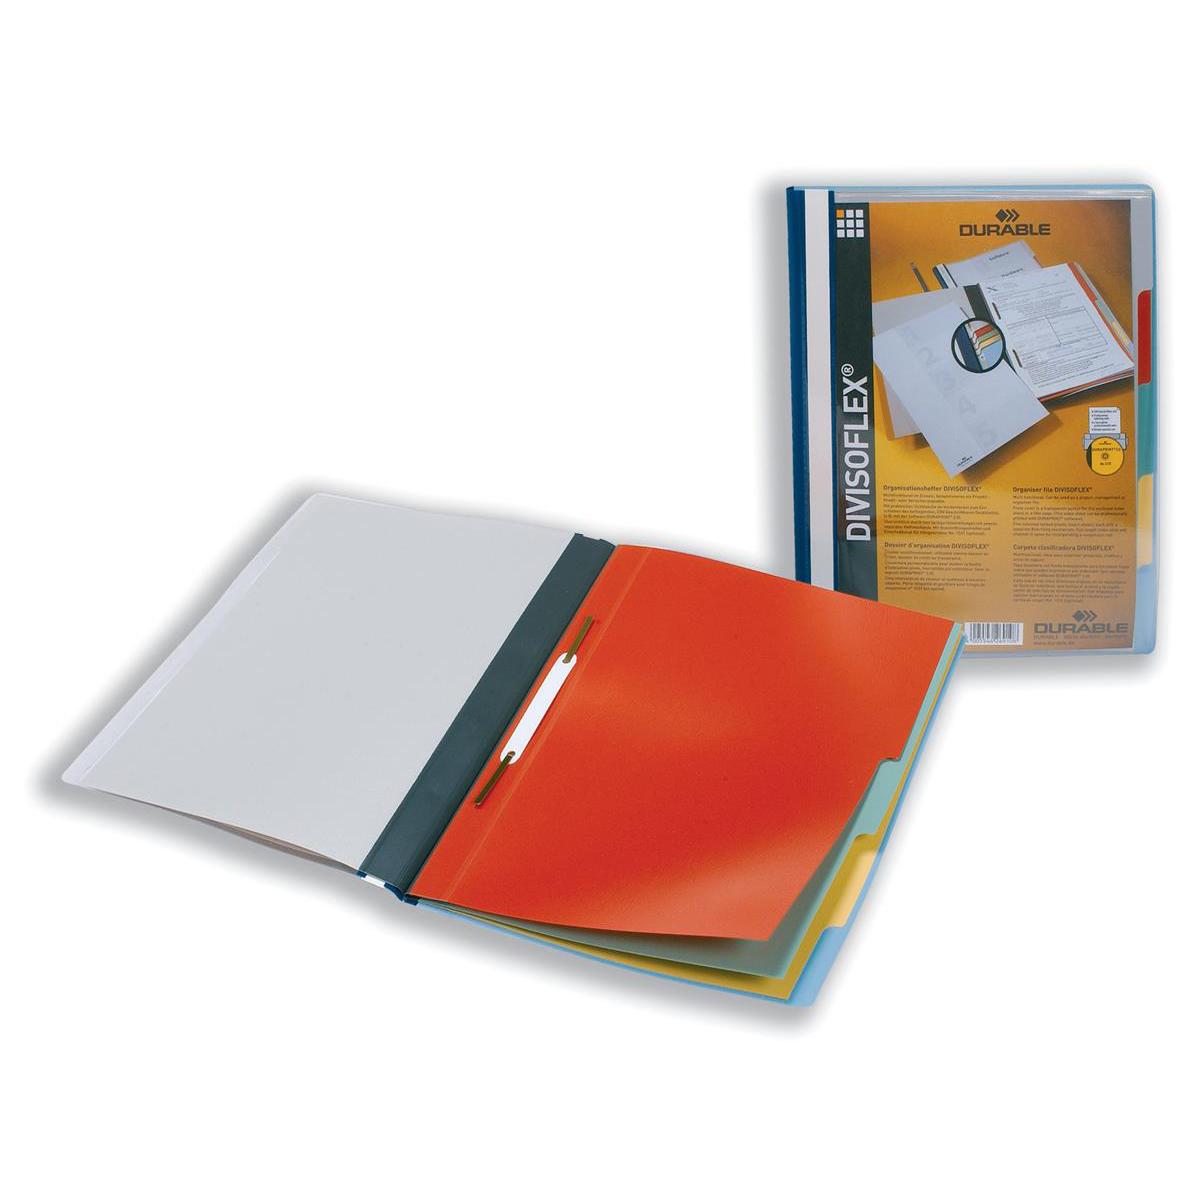 Durable Divisoflex Project Flat File Plastic Capacity 15mm A4 Blue Ref 2557/06